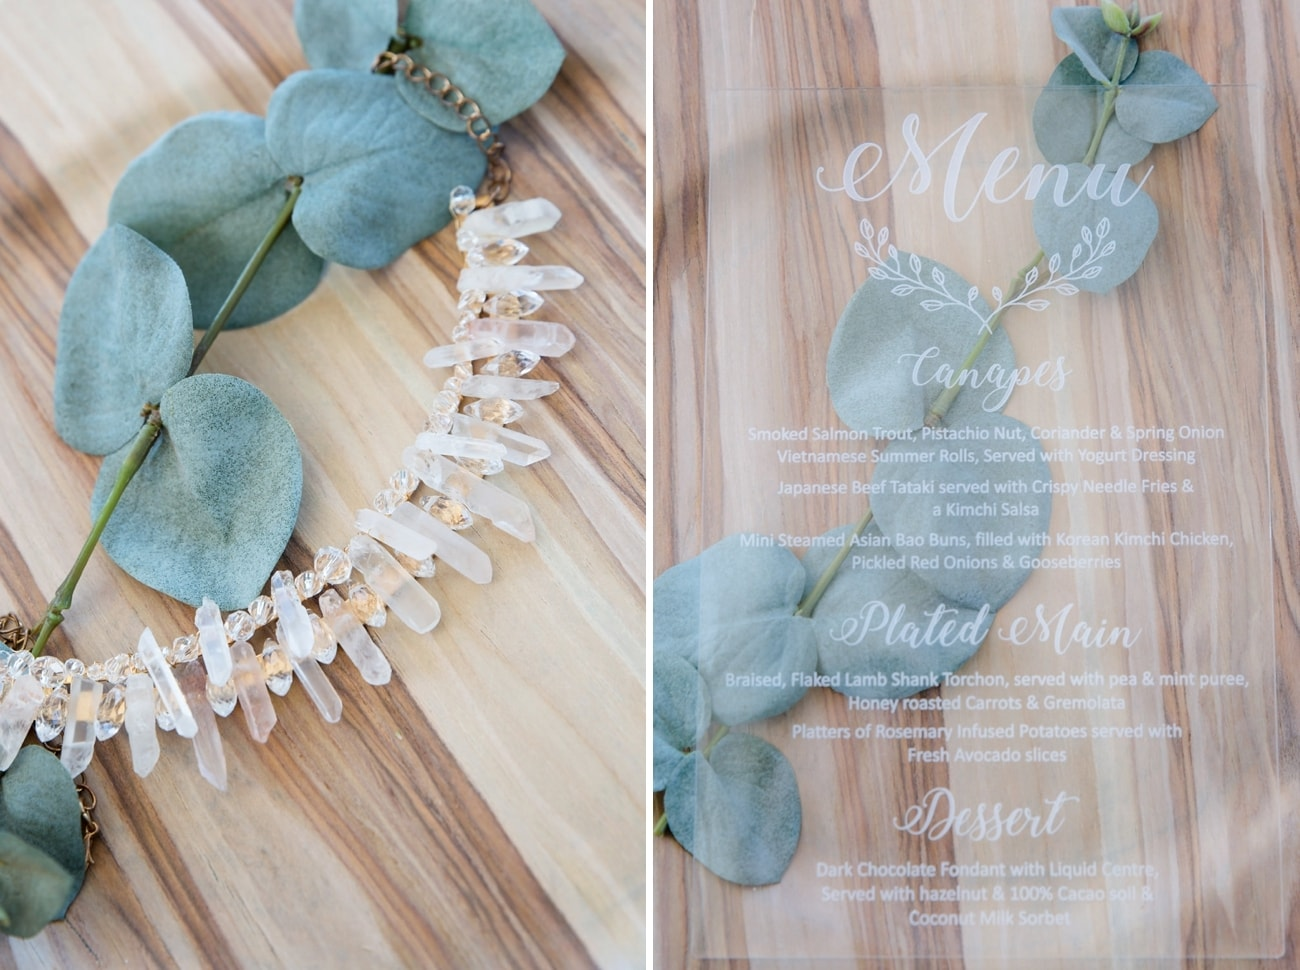 Crystal Bridal Necklace & Perspex Menu | Image: Jaqui Franco